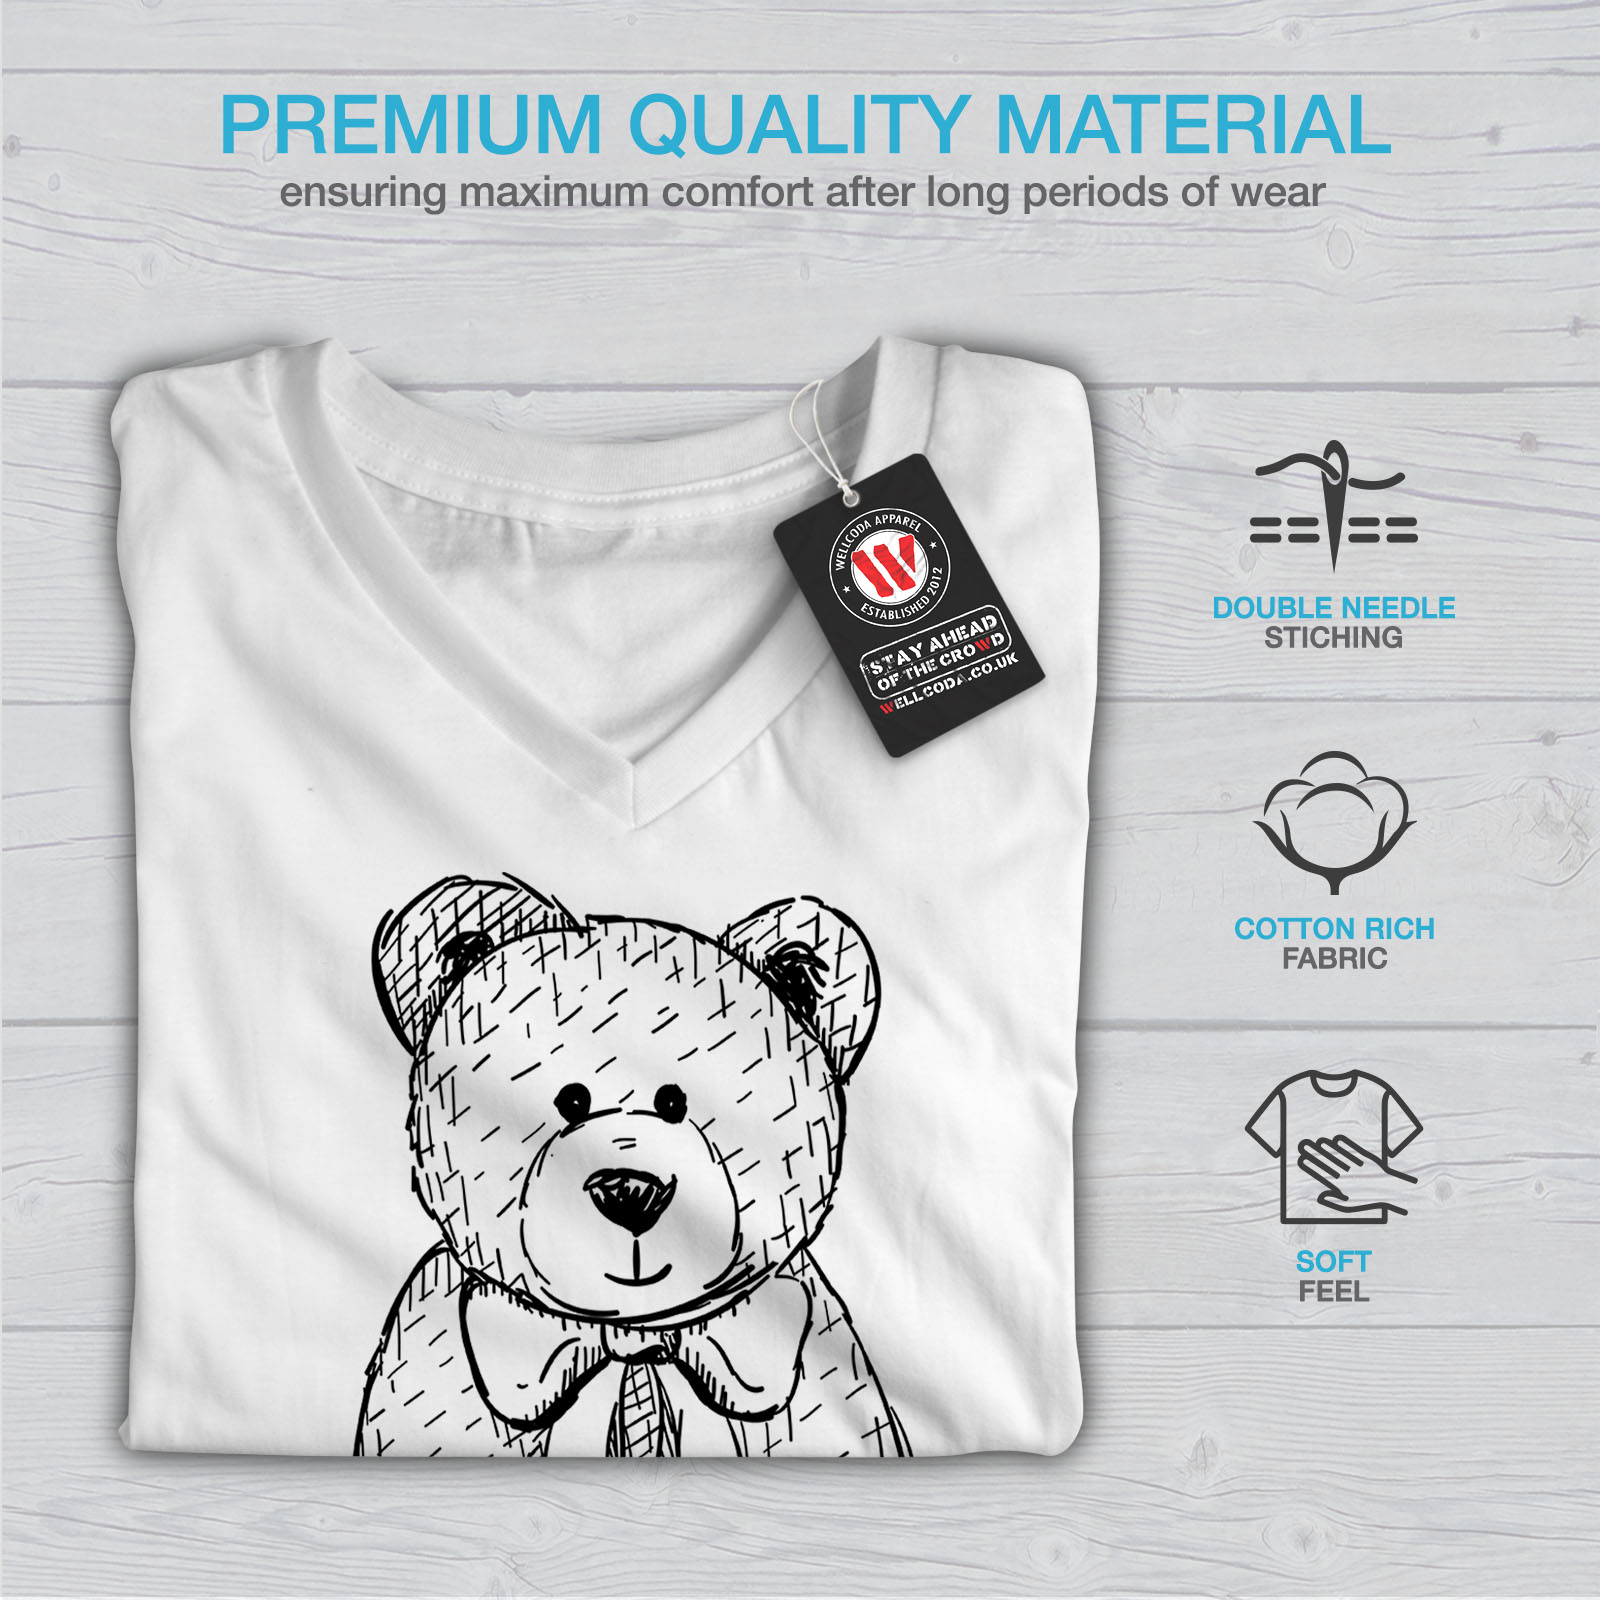 miniature 9 - Wellcoda Hug Me Teddy Bear Womens V-Neck T-shirt, Nice & Graphic Design Tee